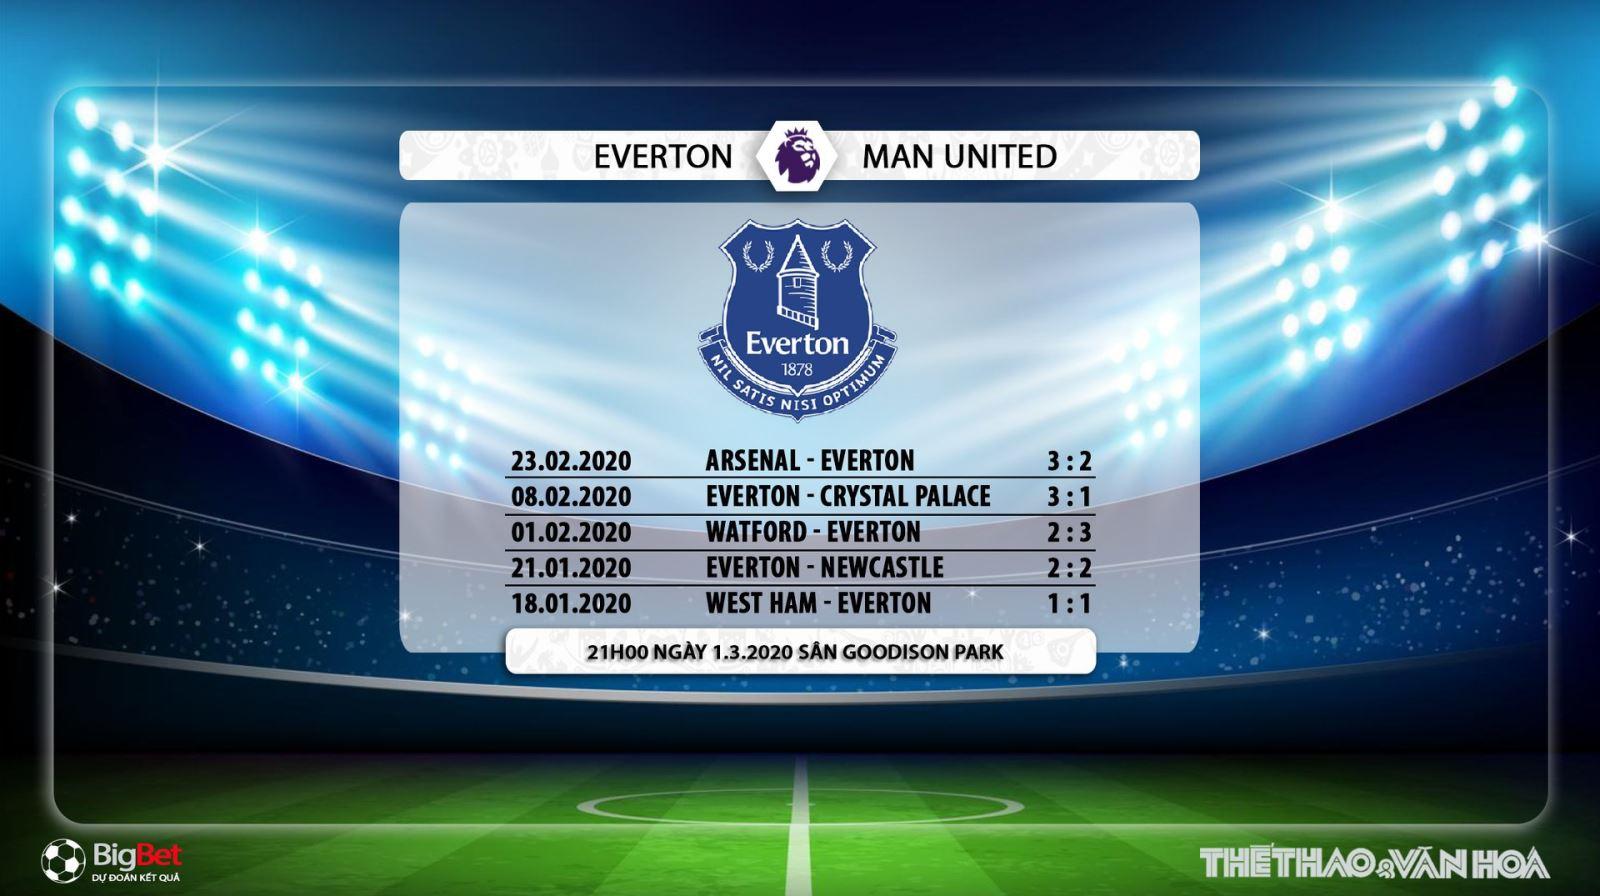 Everton vs MU, mu, everton, trực tiếp bóng đá, soi kèo Everton vs MU, nhận định Everton vs MU, K+PM, K+PC